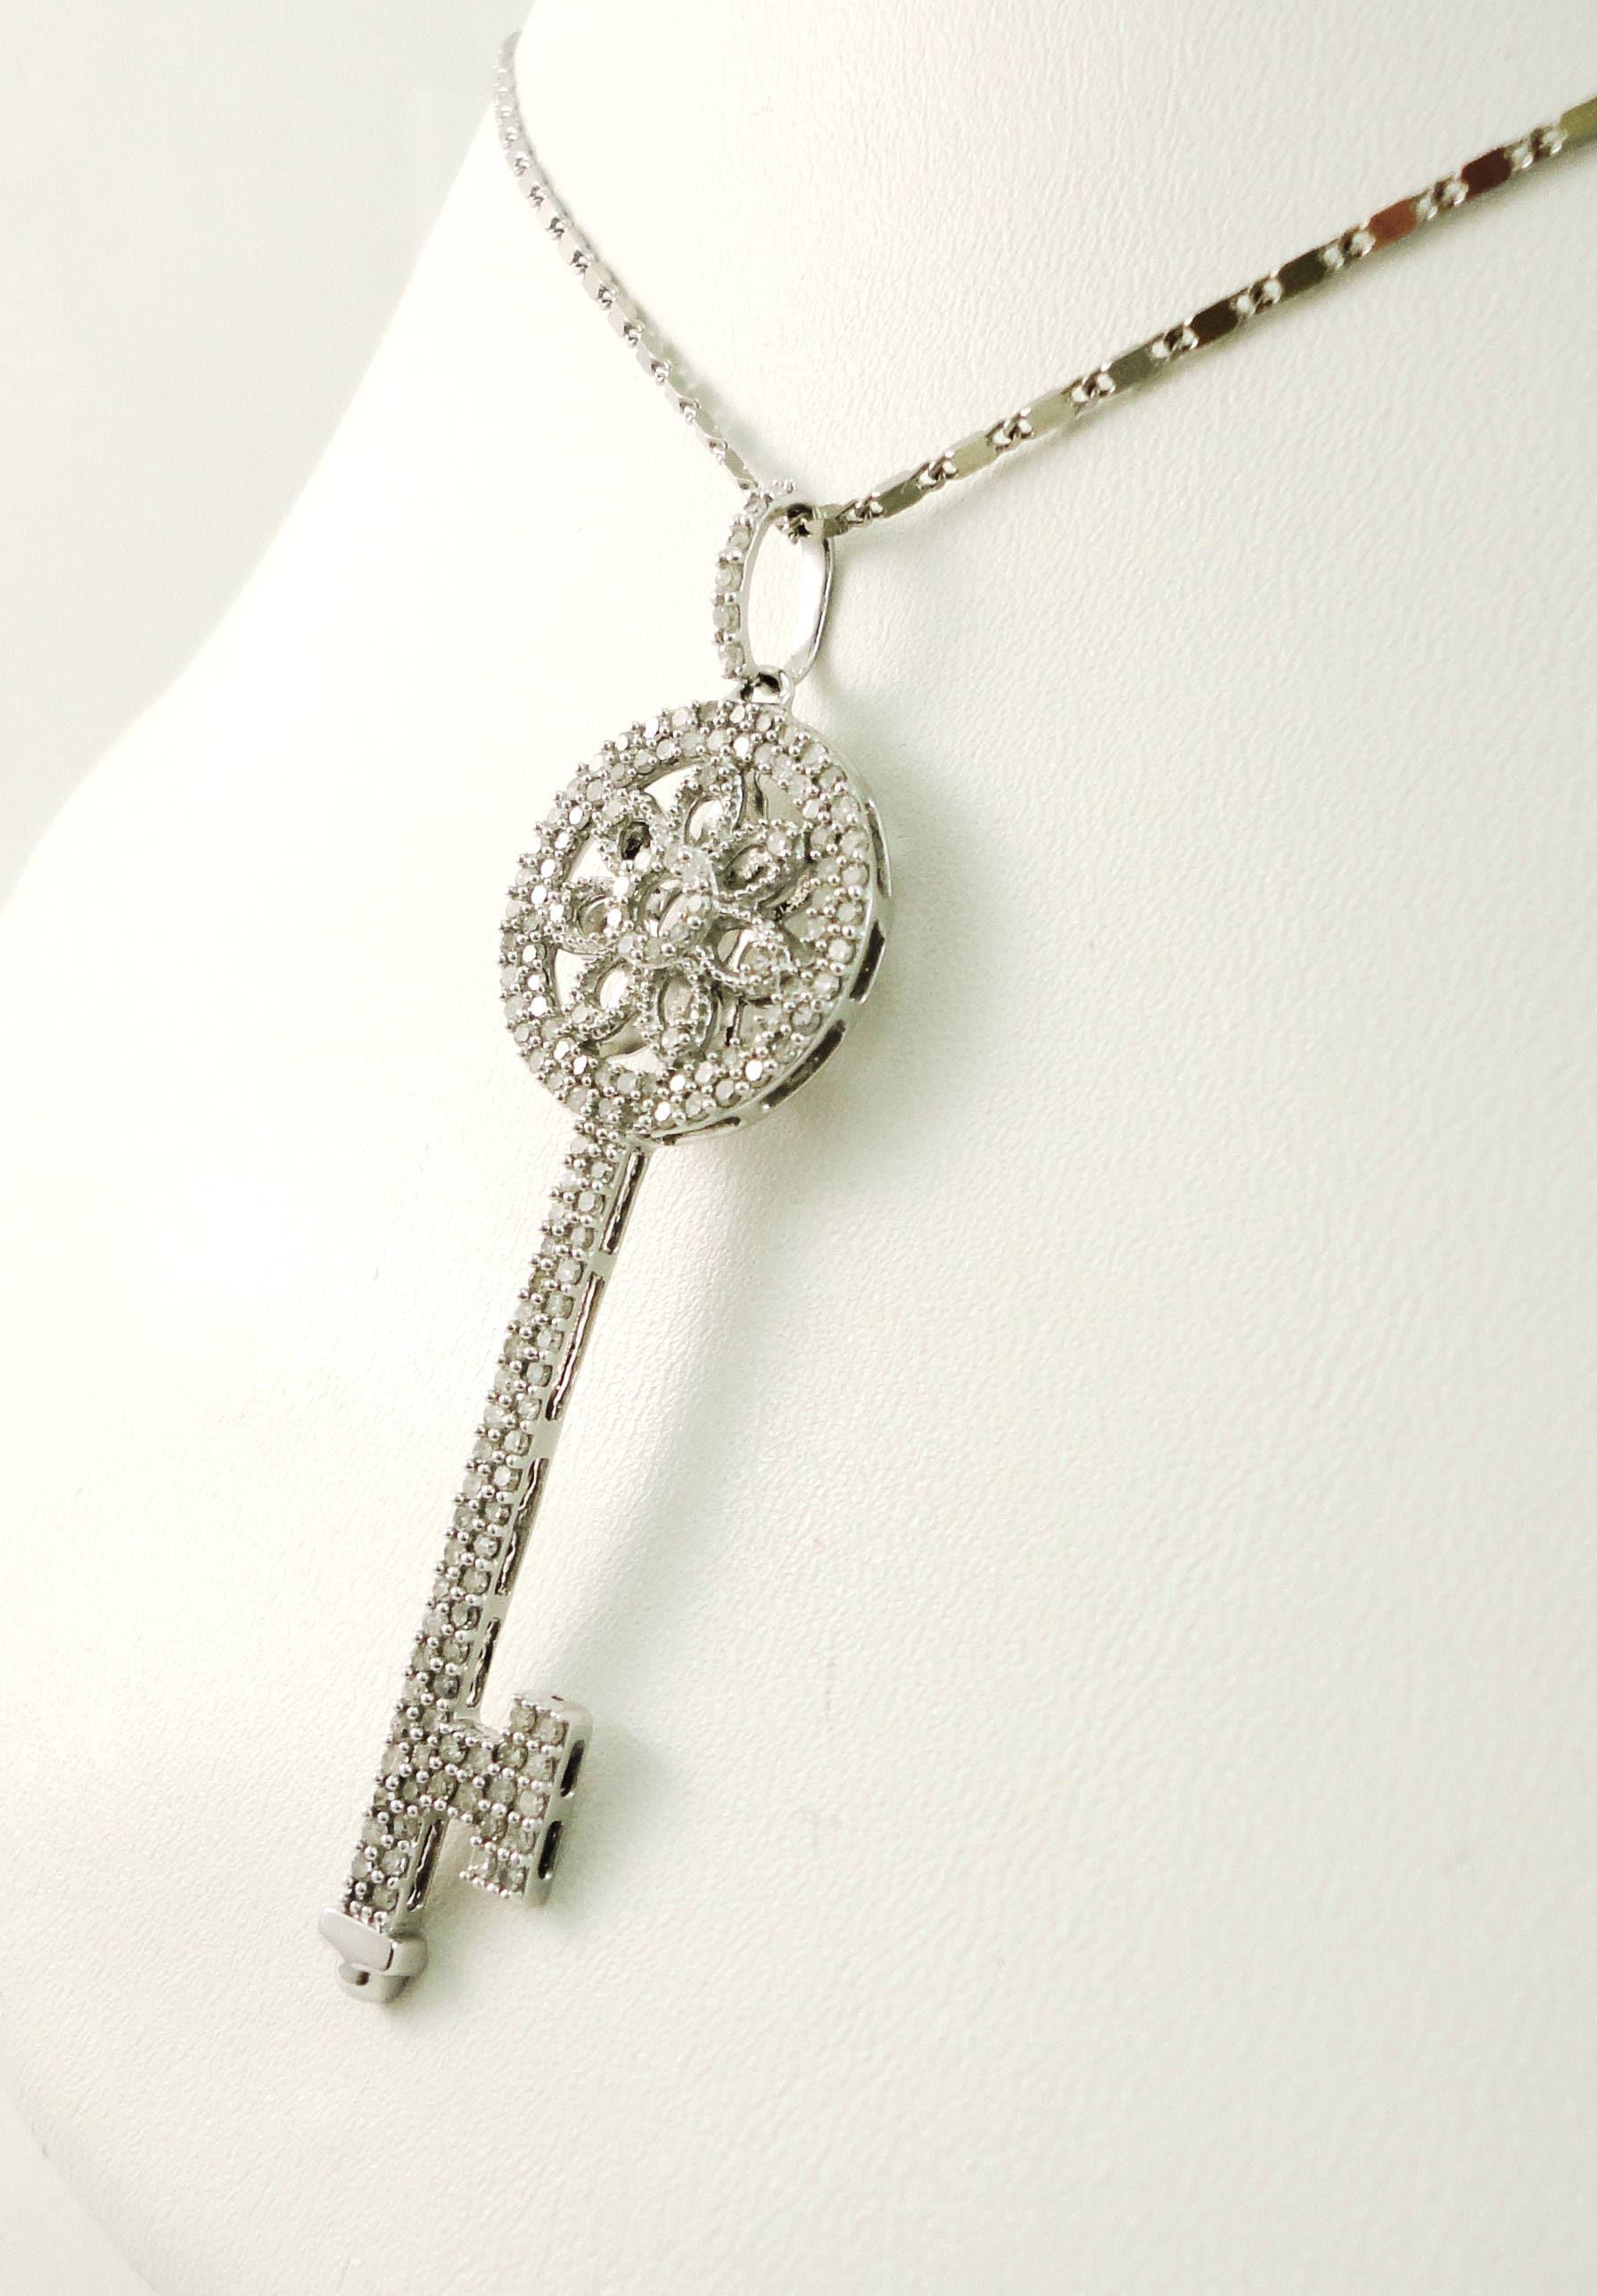 Diamond key necklace key necklace pave diamonds white gold zoom mozeypictures Image collections